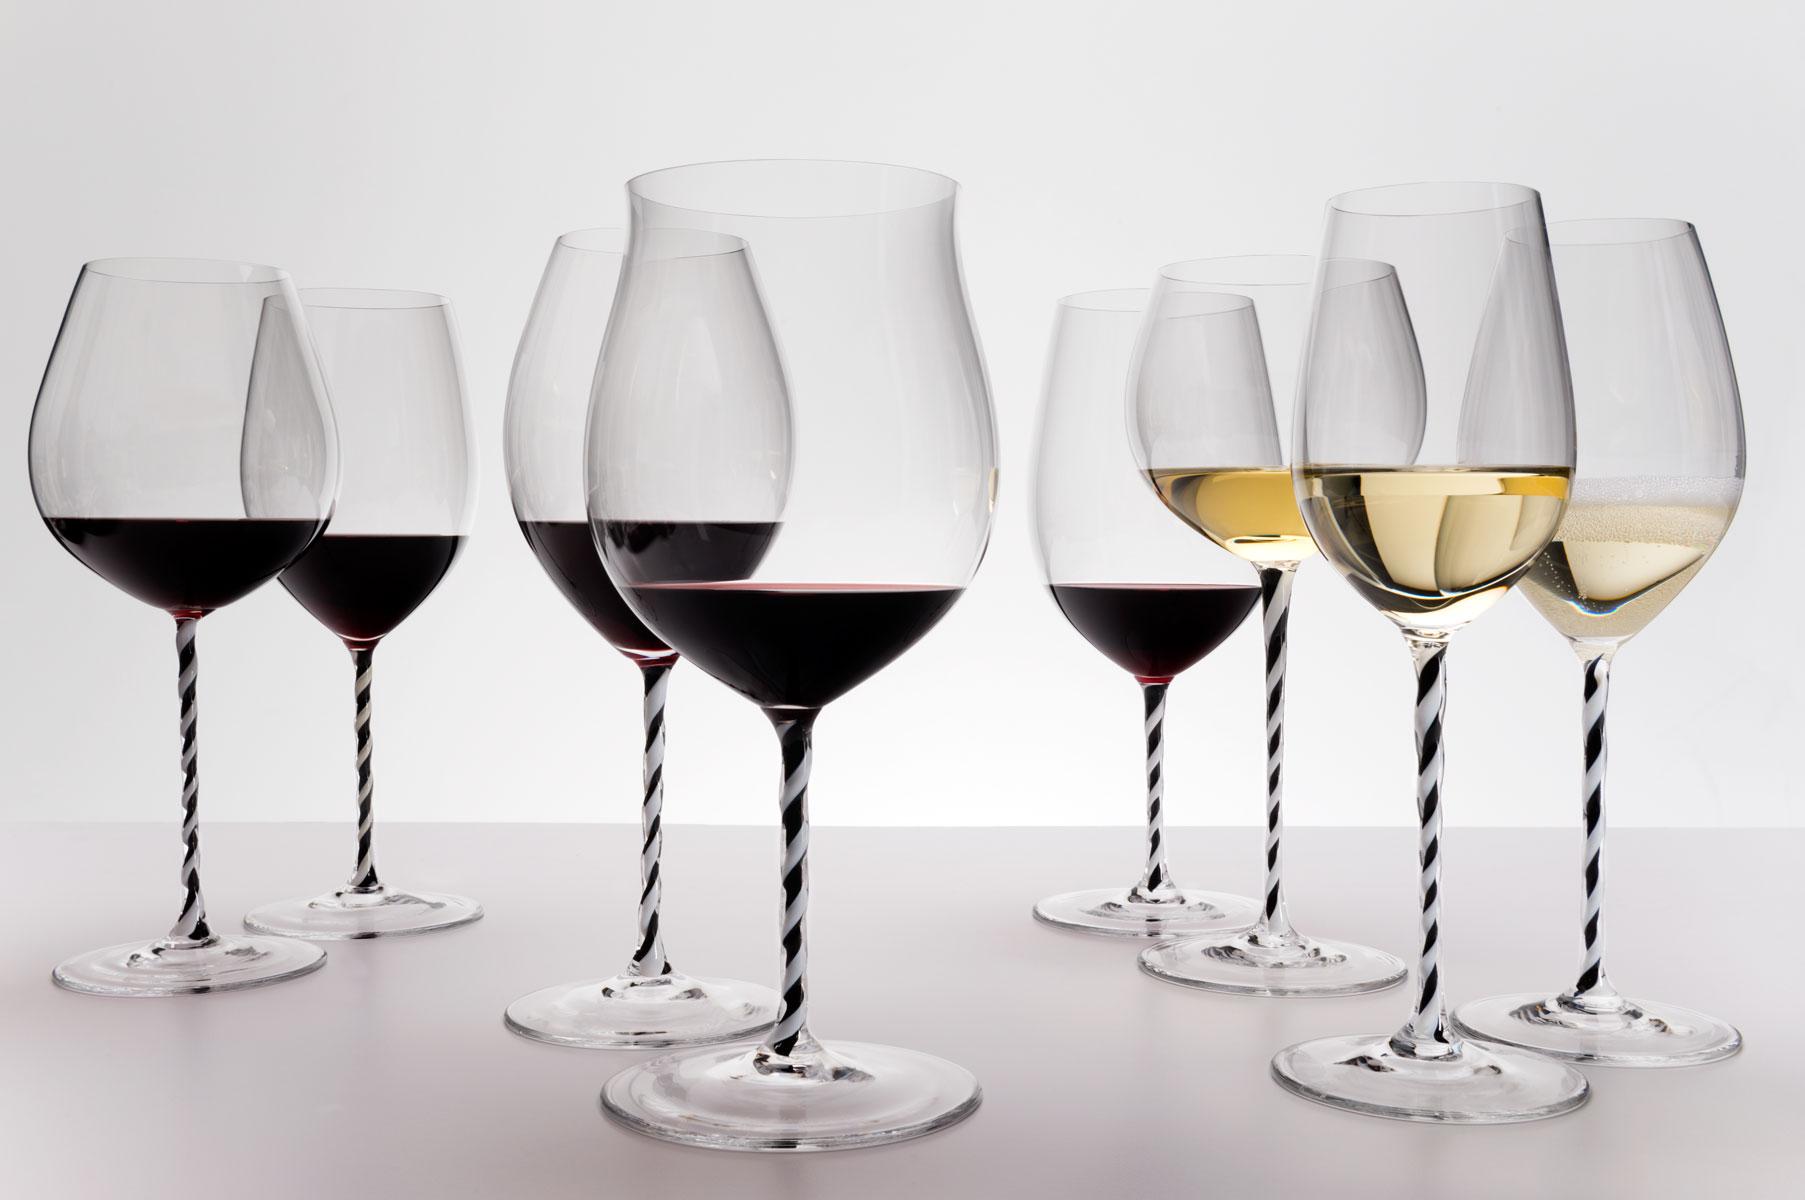 Бокал белого и красного вина фото